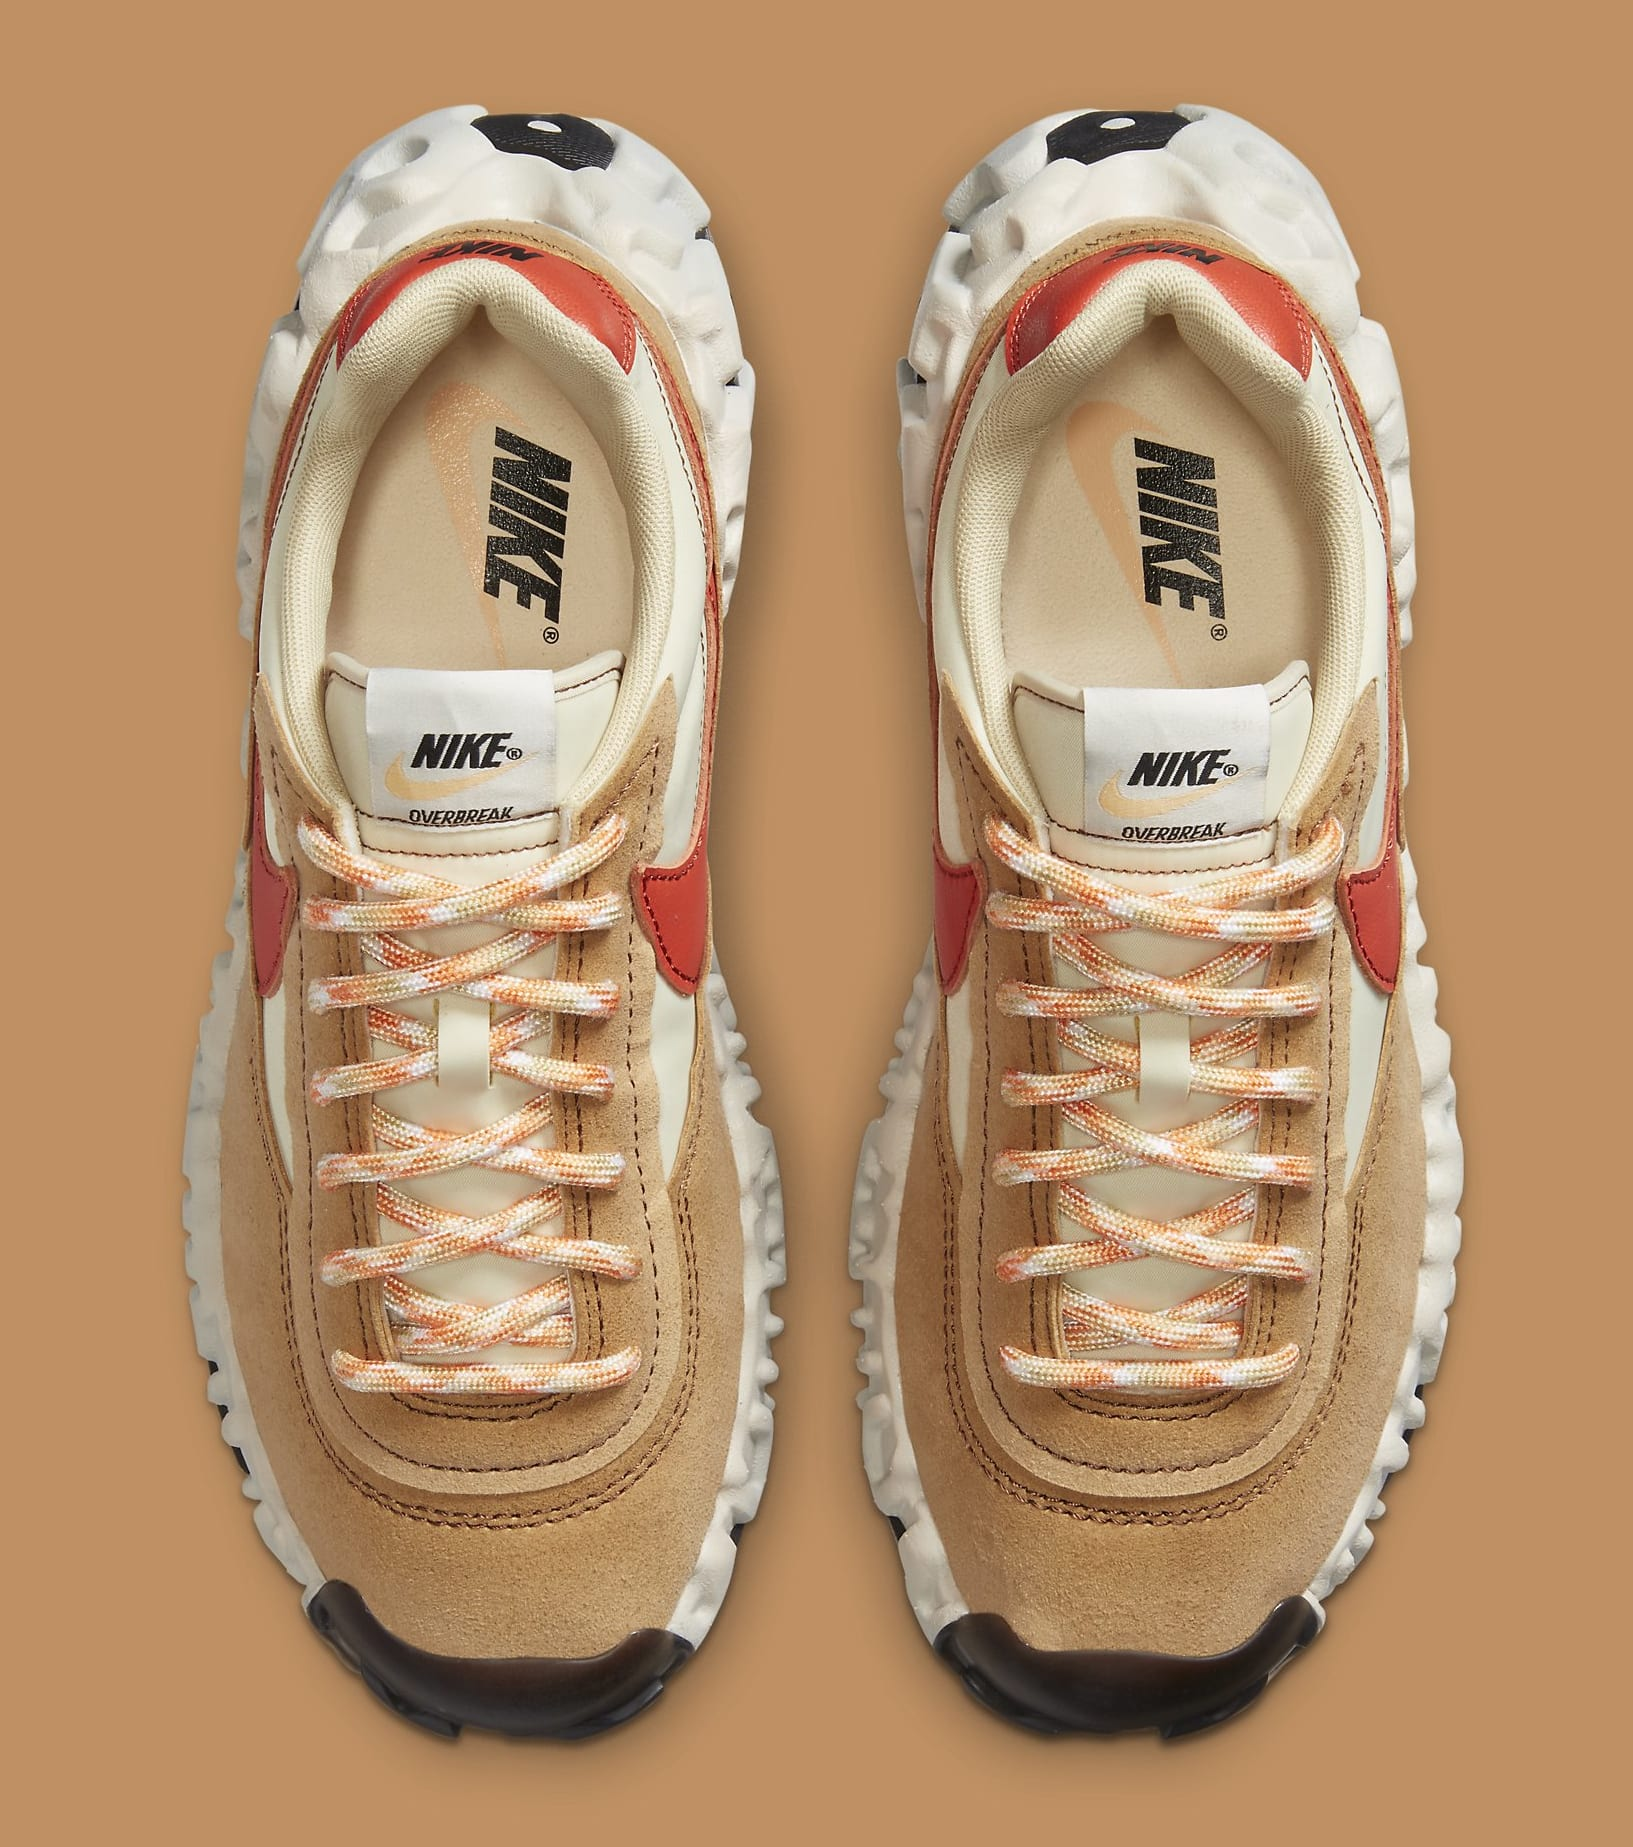 Nike OverBreak 'Mars Yard' DA9784-700 Top